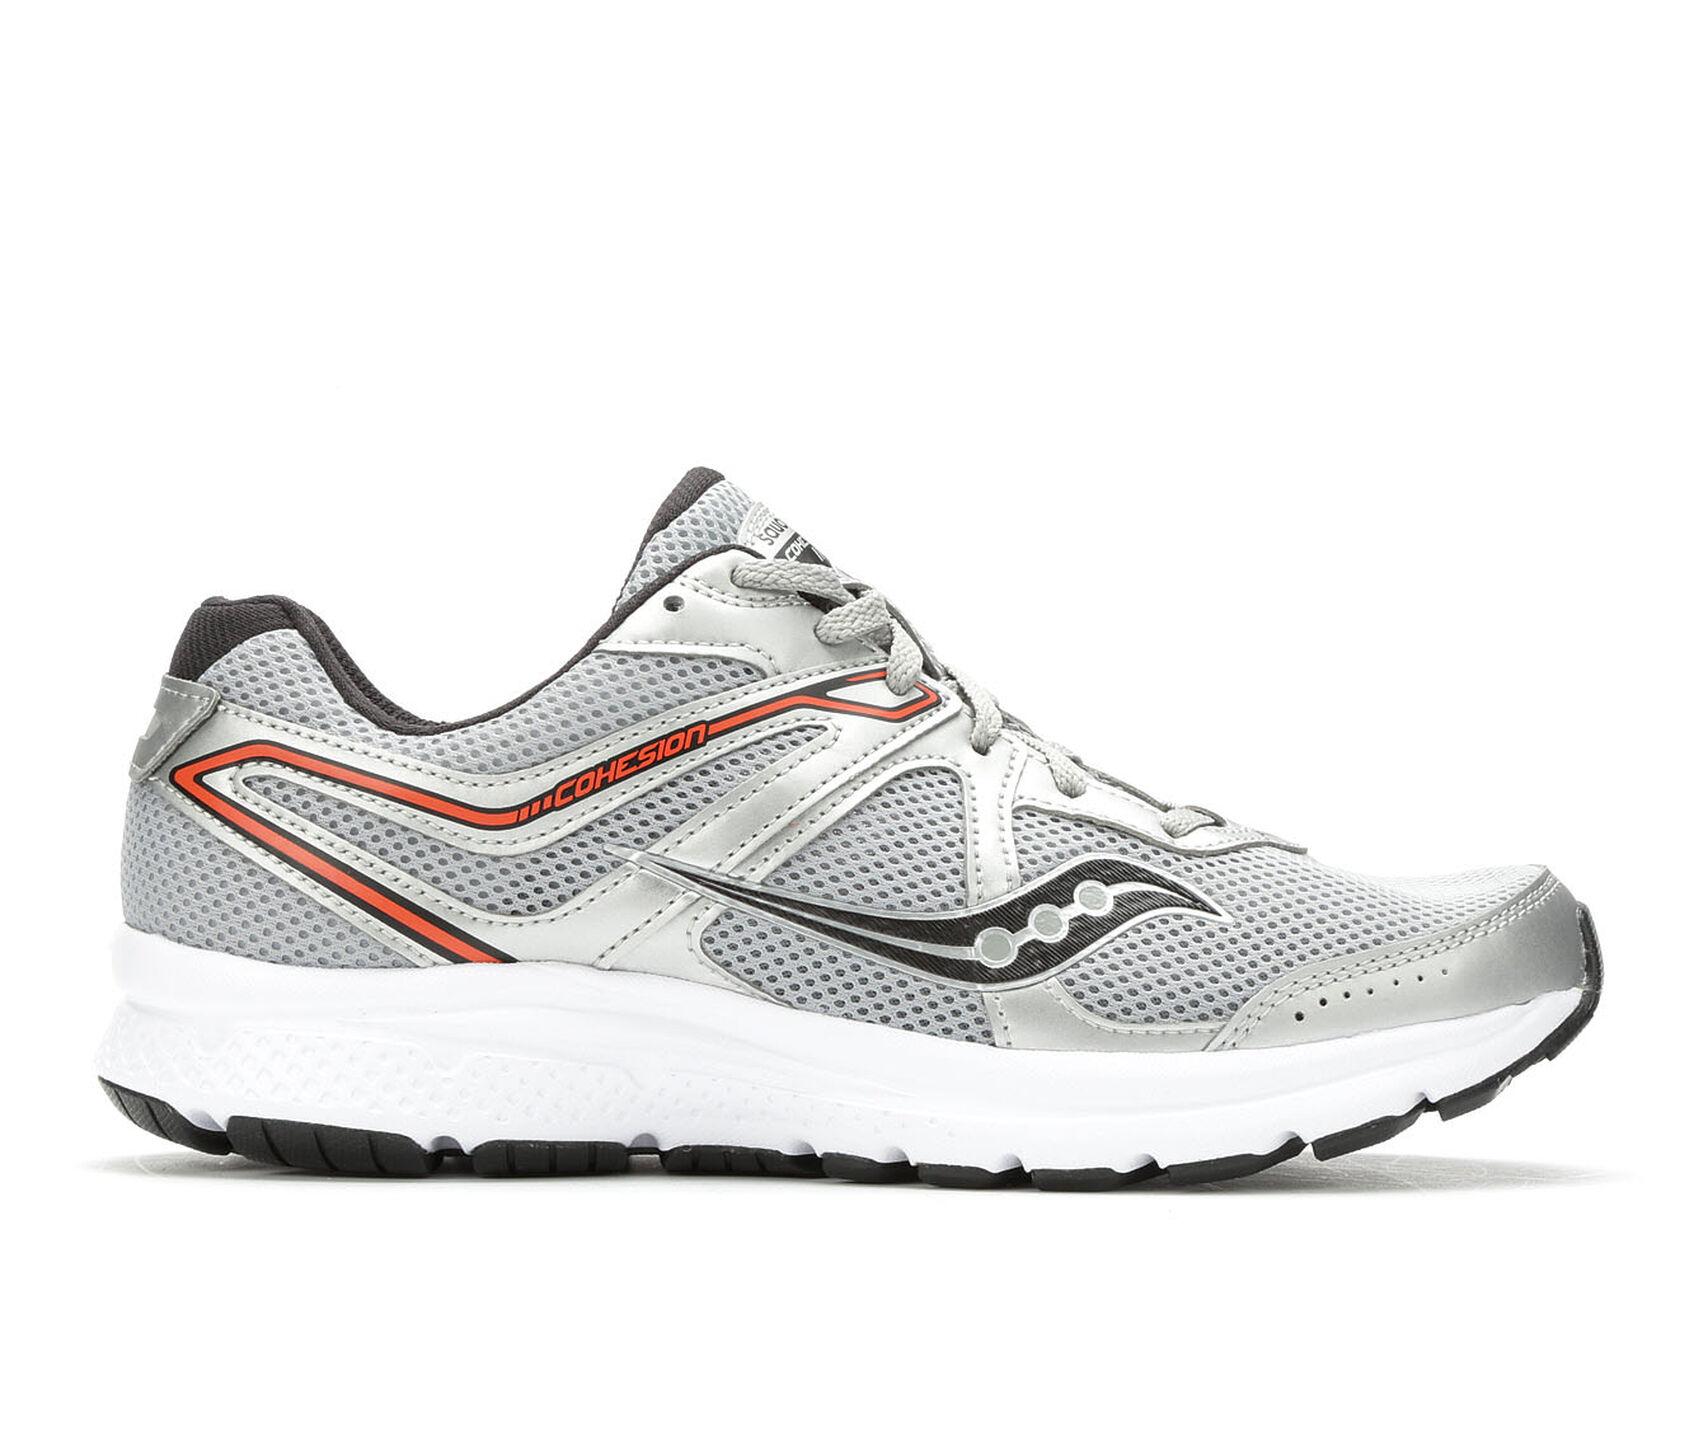 d01df6251037 Images. Men  39 s Saucony Cohesion 11 Running Shoes